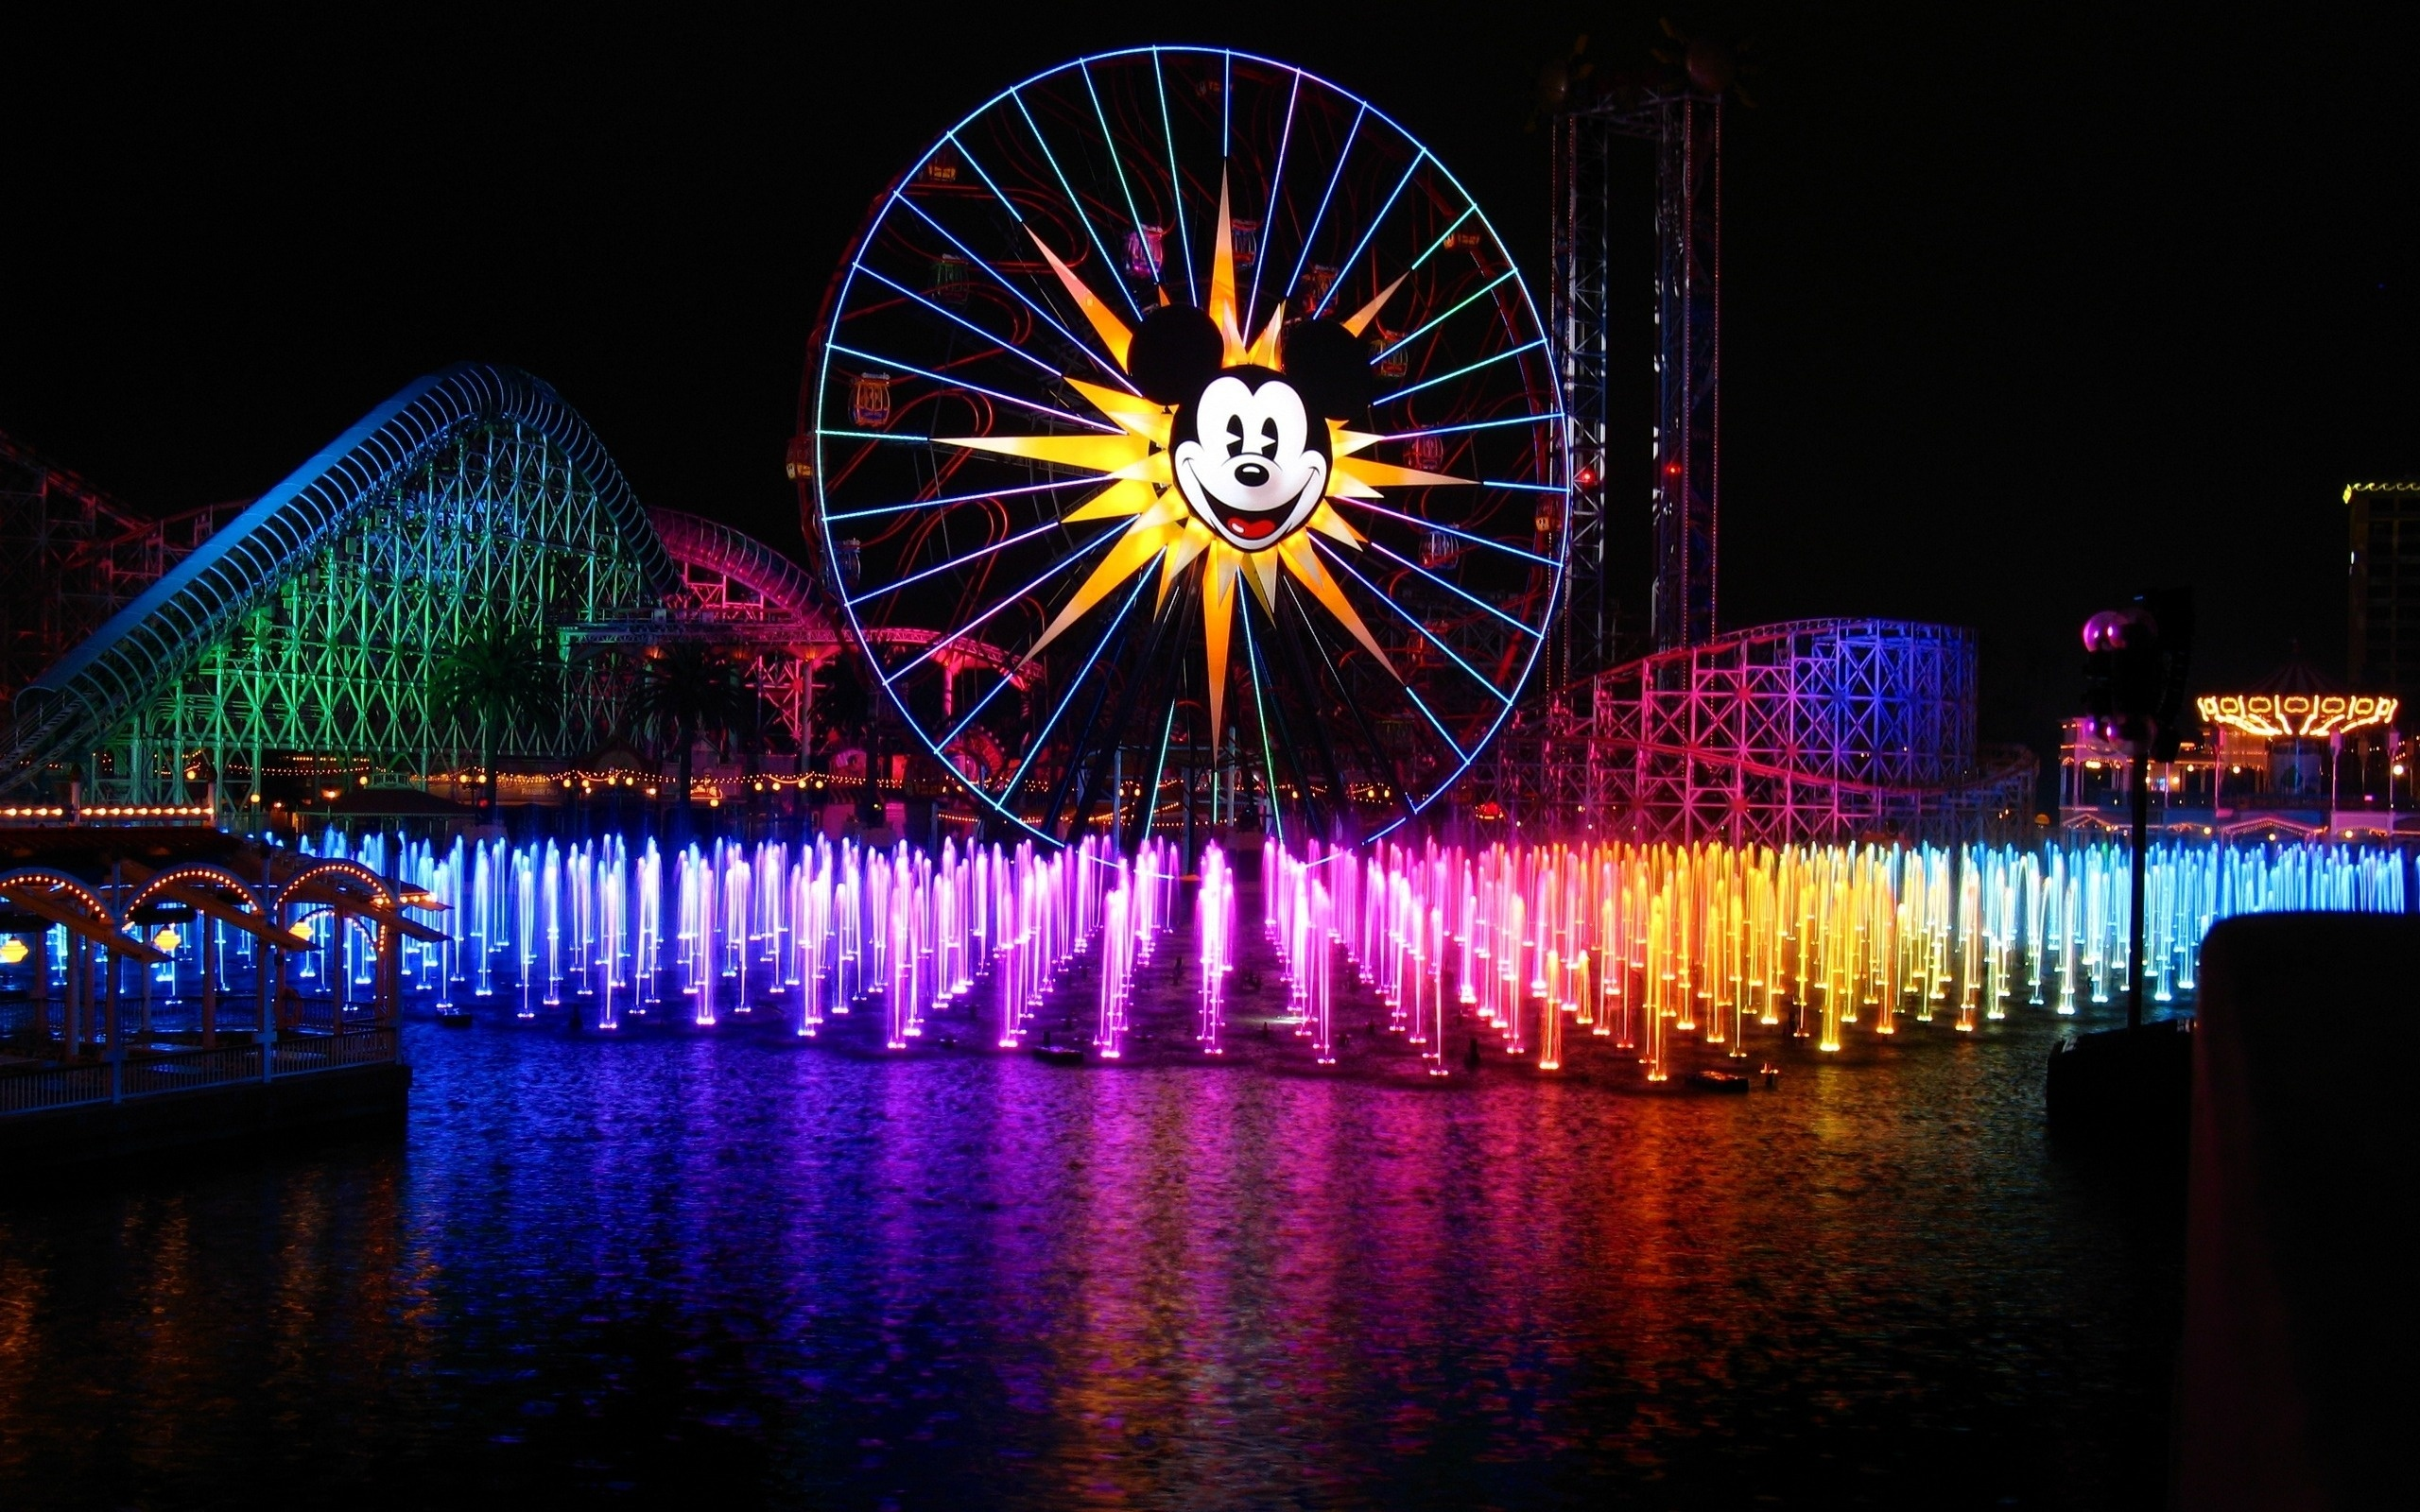 Wallpaper night fountain Disneyland Anaheim California mickey 2560x1600